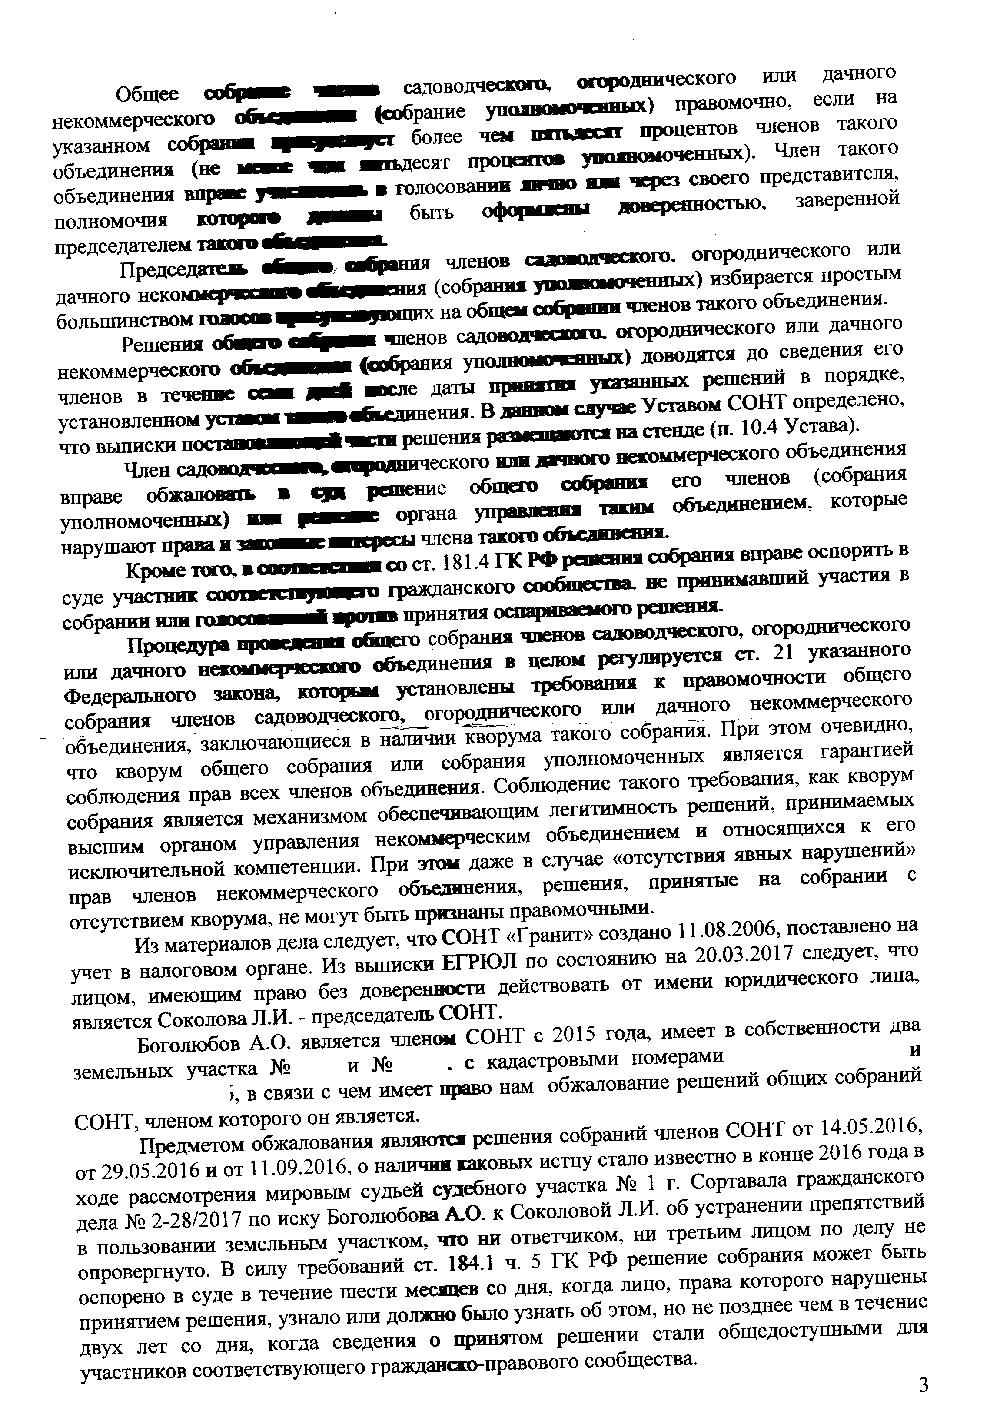 https://sontgranit.ru/forum/img/sokol/решение4.png